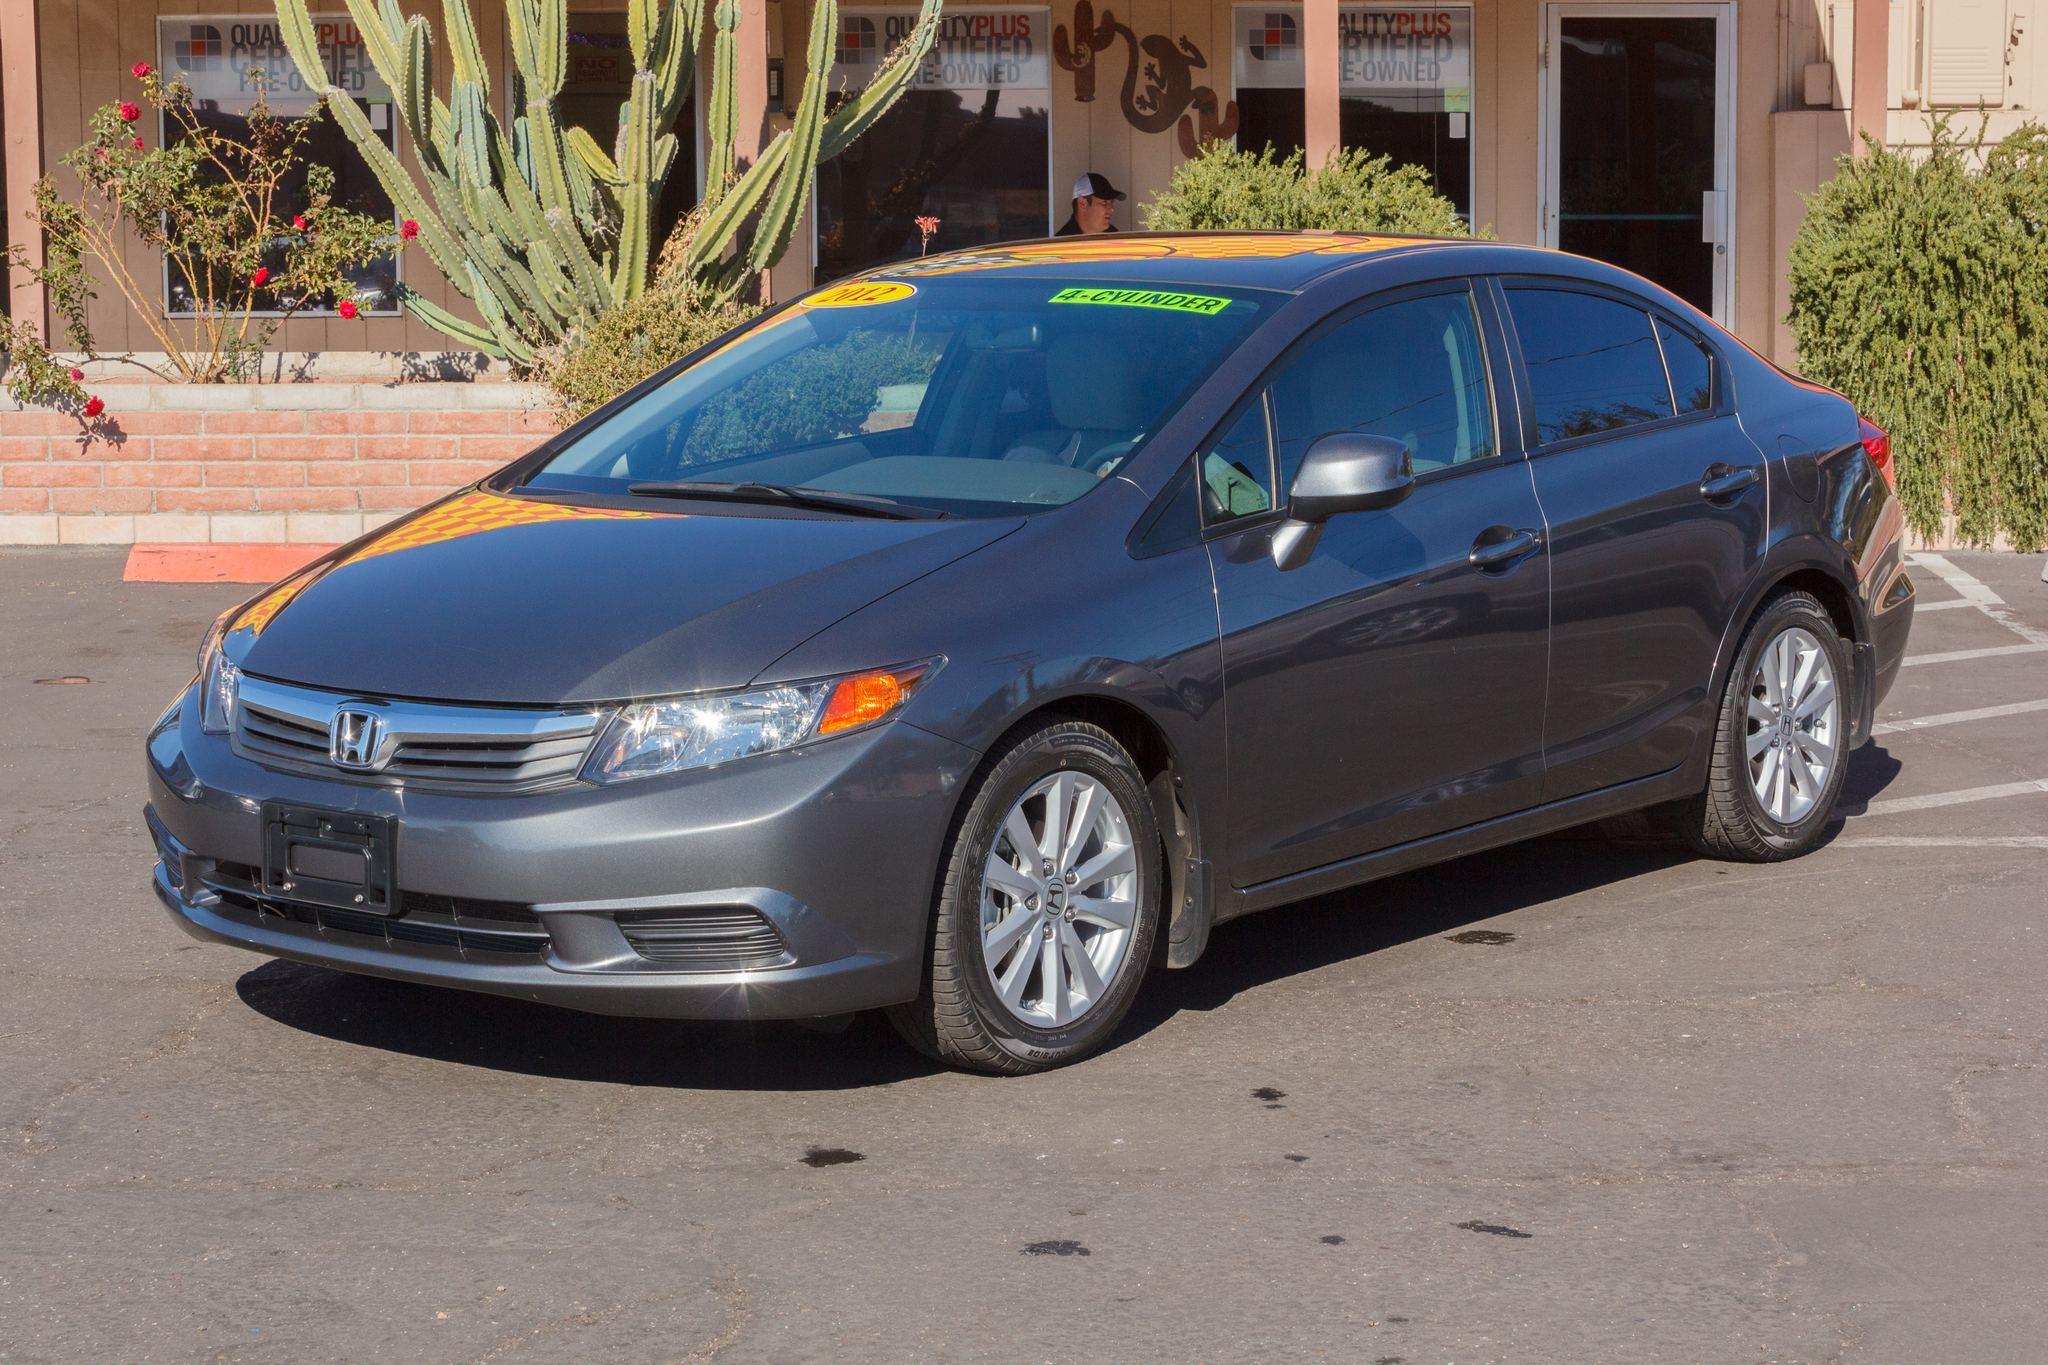 Photo of 2012 Honda Civic Sedan 4d Sedan EX Polished Metal Metallic